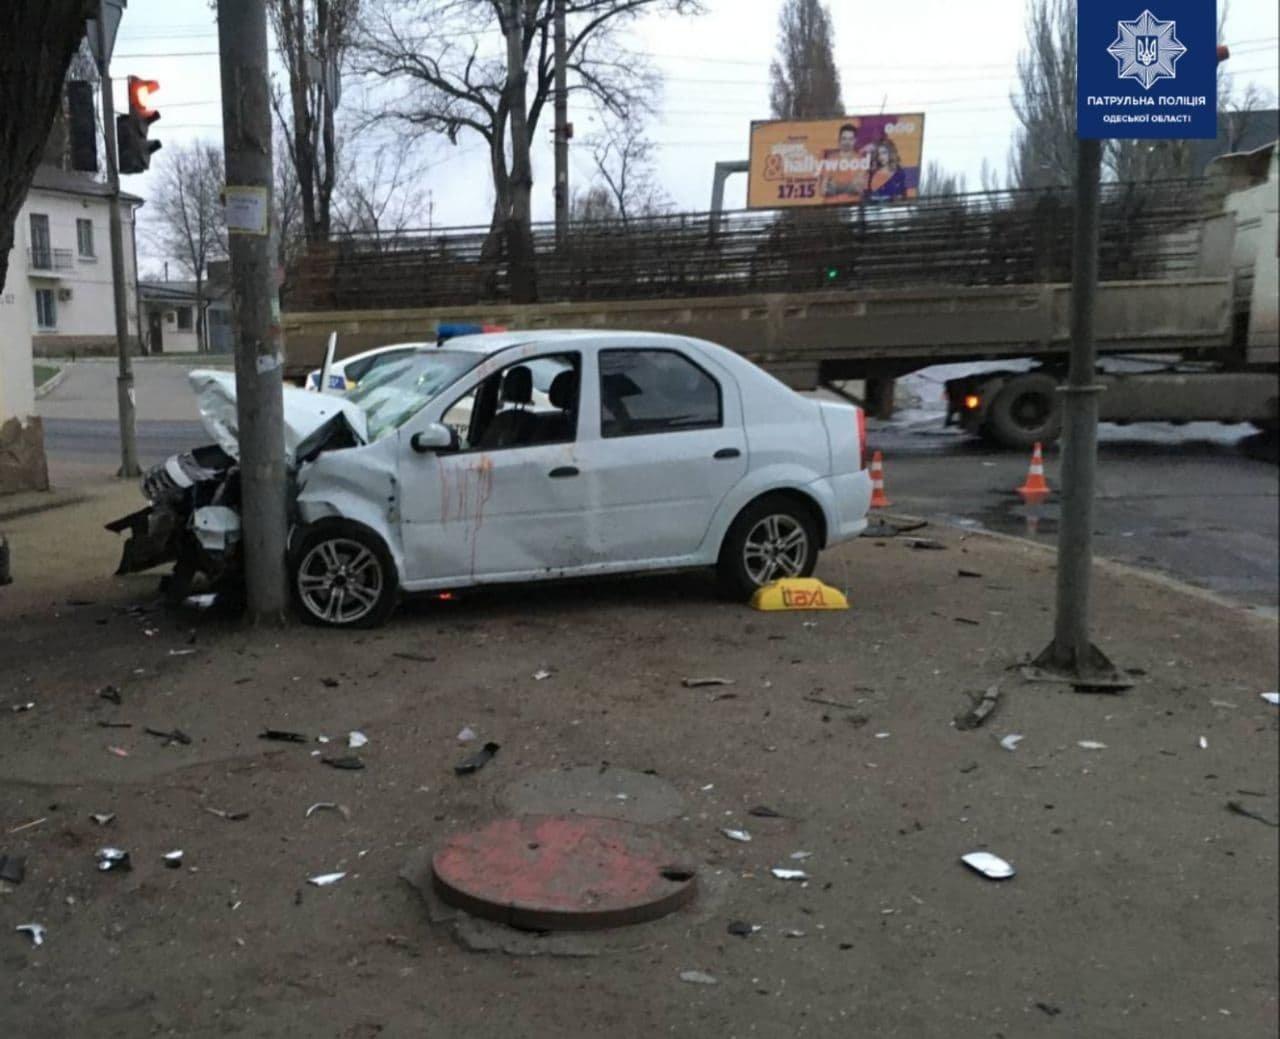 В Одессе по вине пьяного водителя в ДТП пострадали три человека, - ФОТО, фото-1